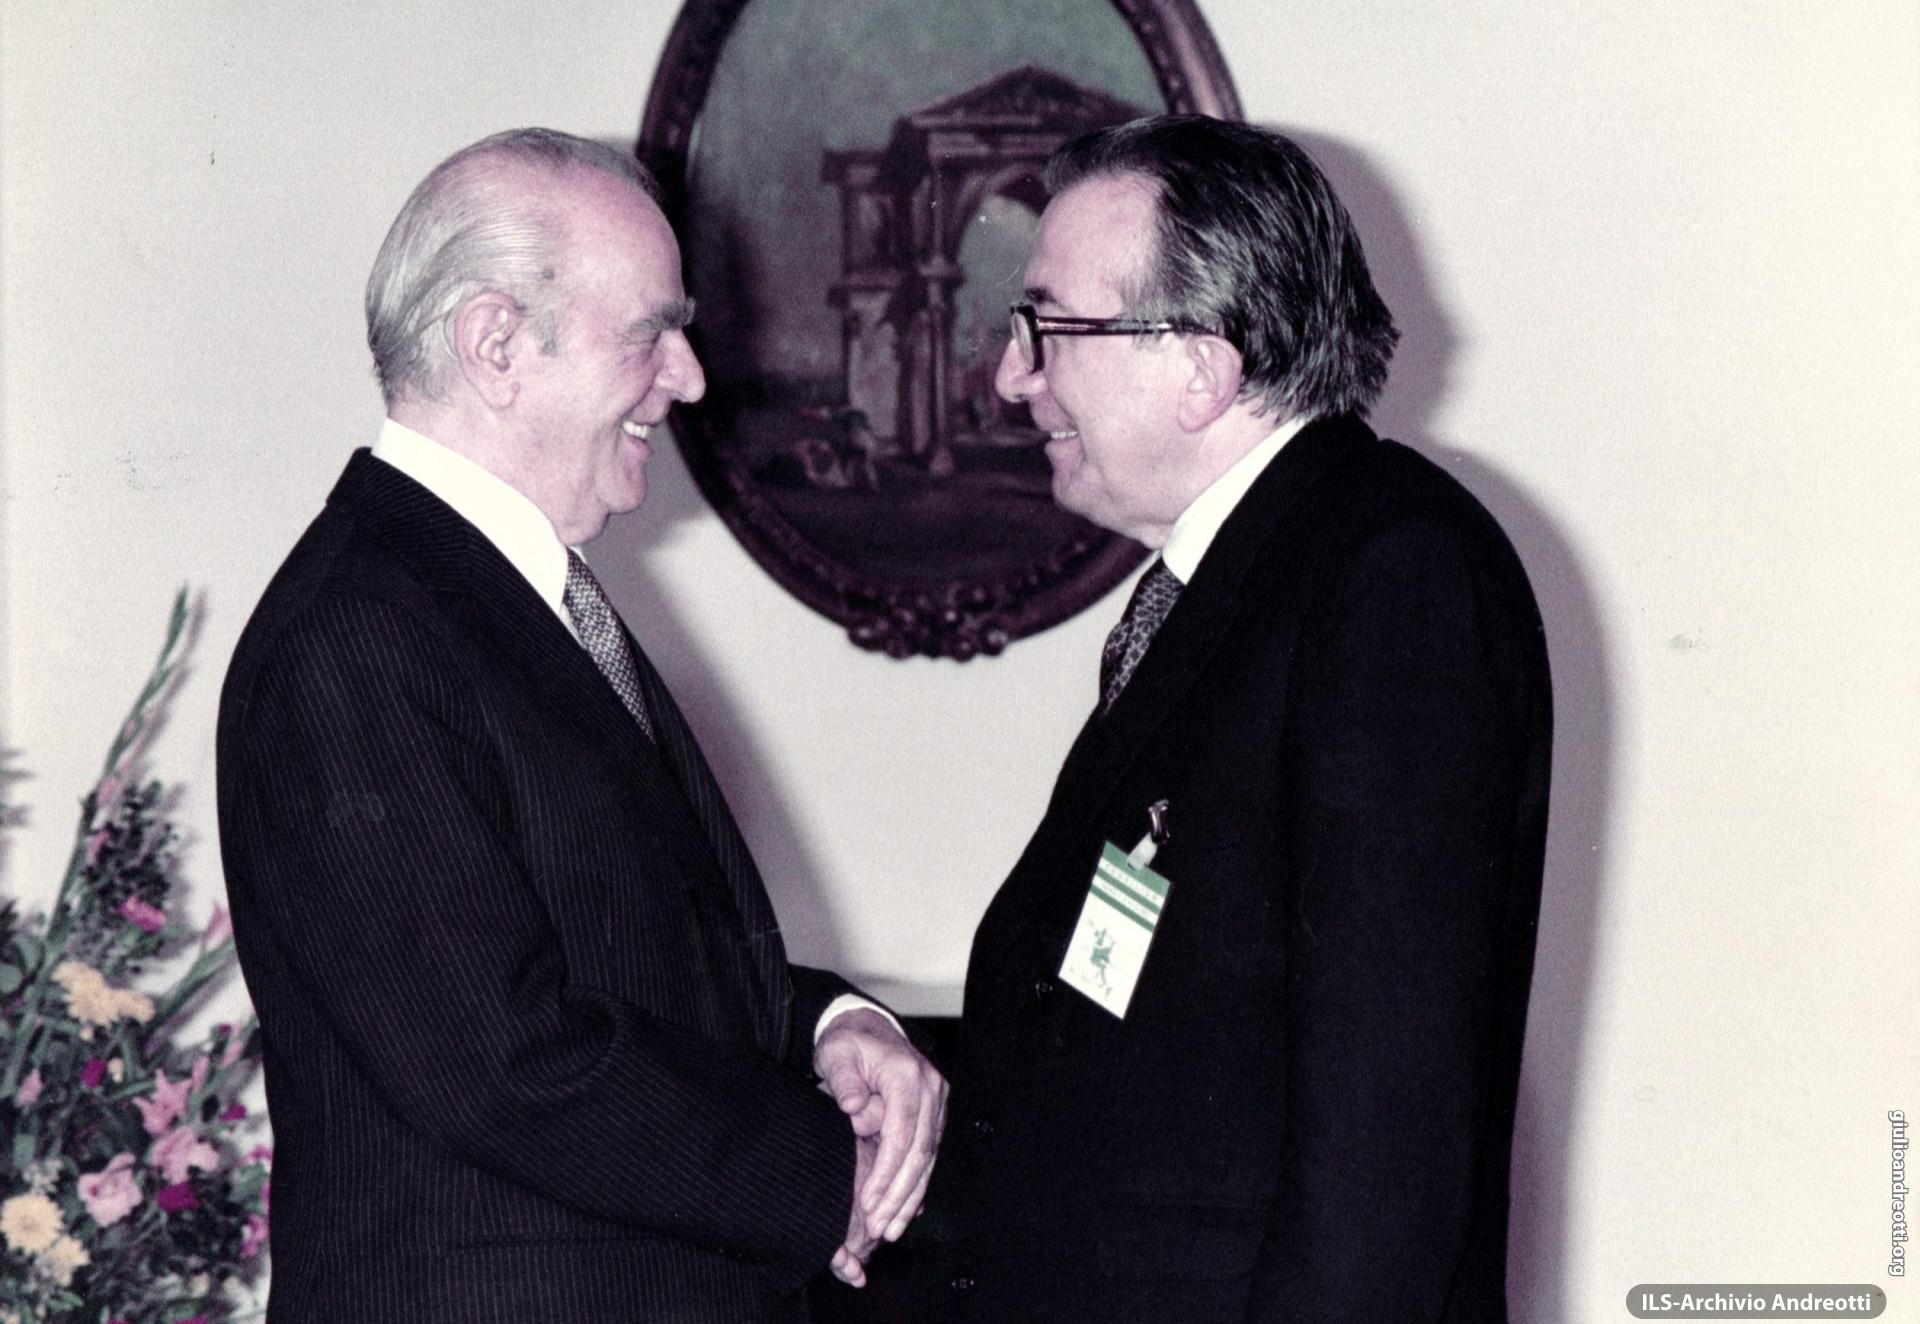 4 dicembre 1983, Atene. Incontro con il presidente greco Kostantinos Karamanlis